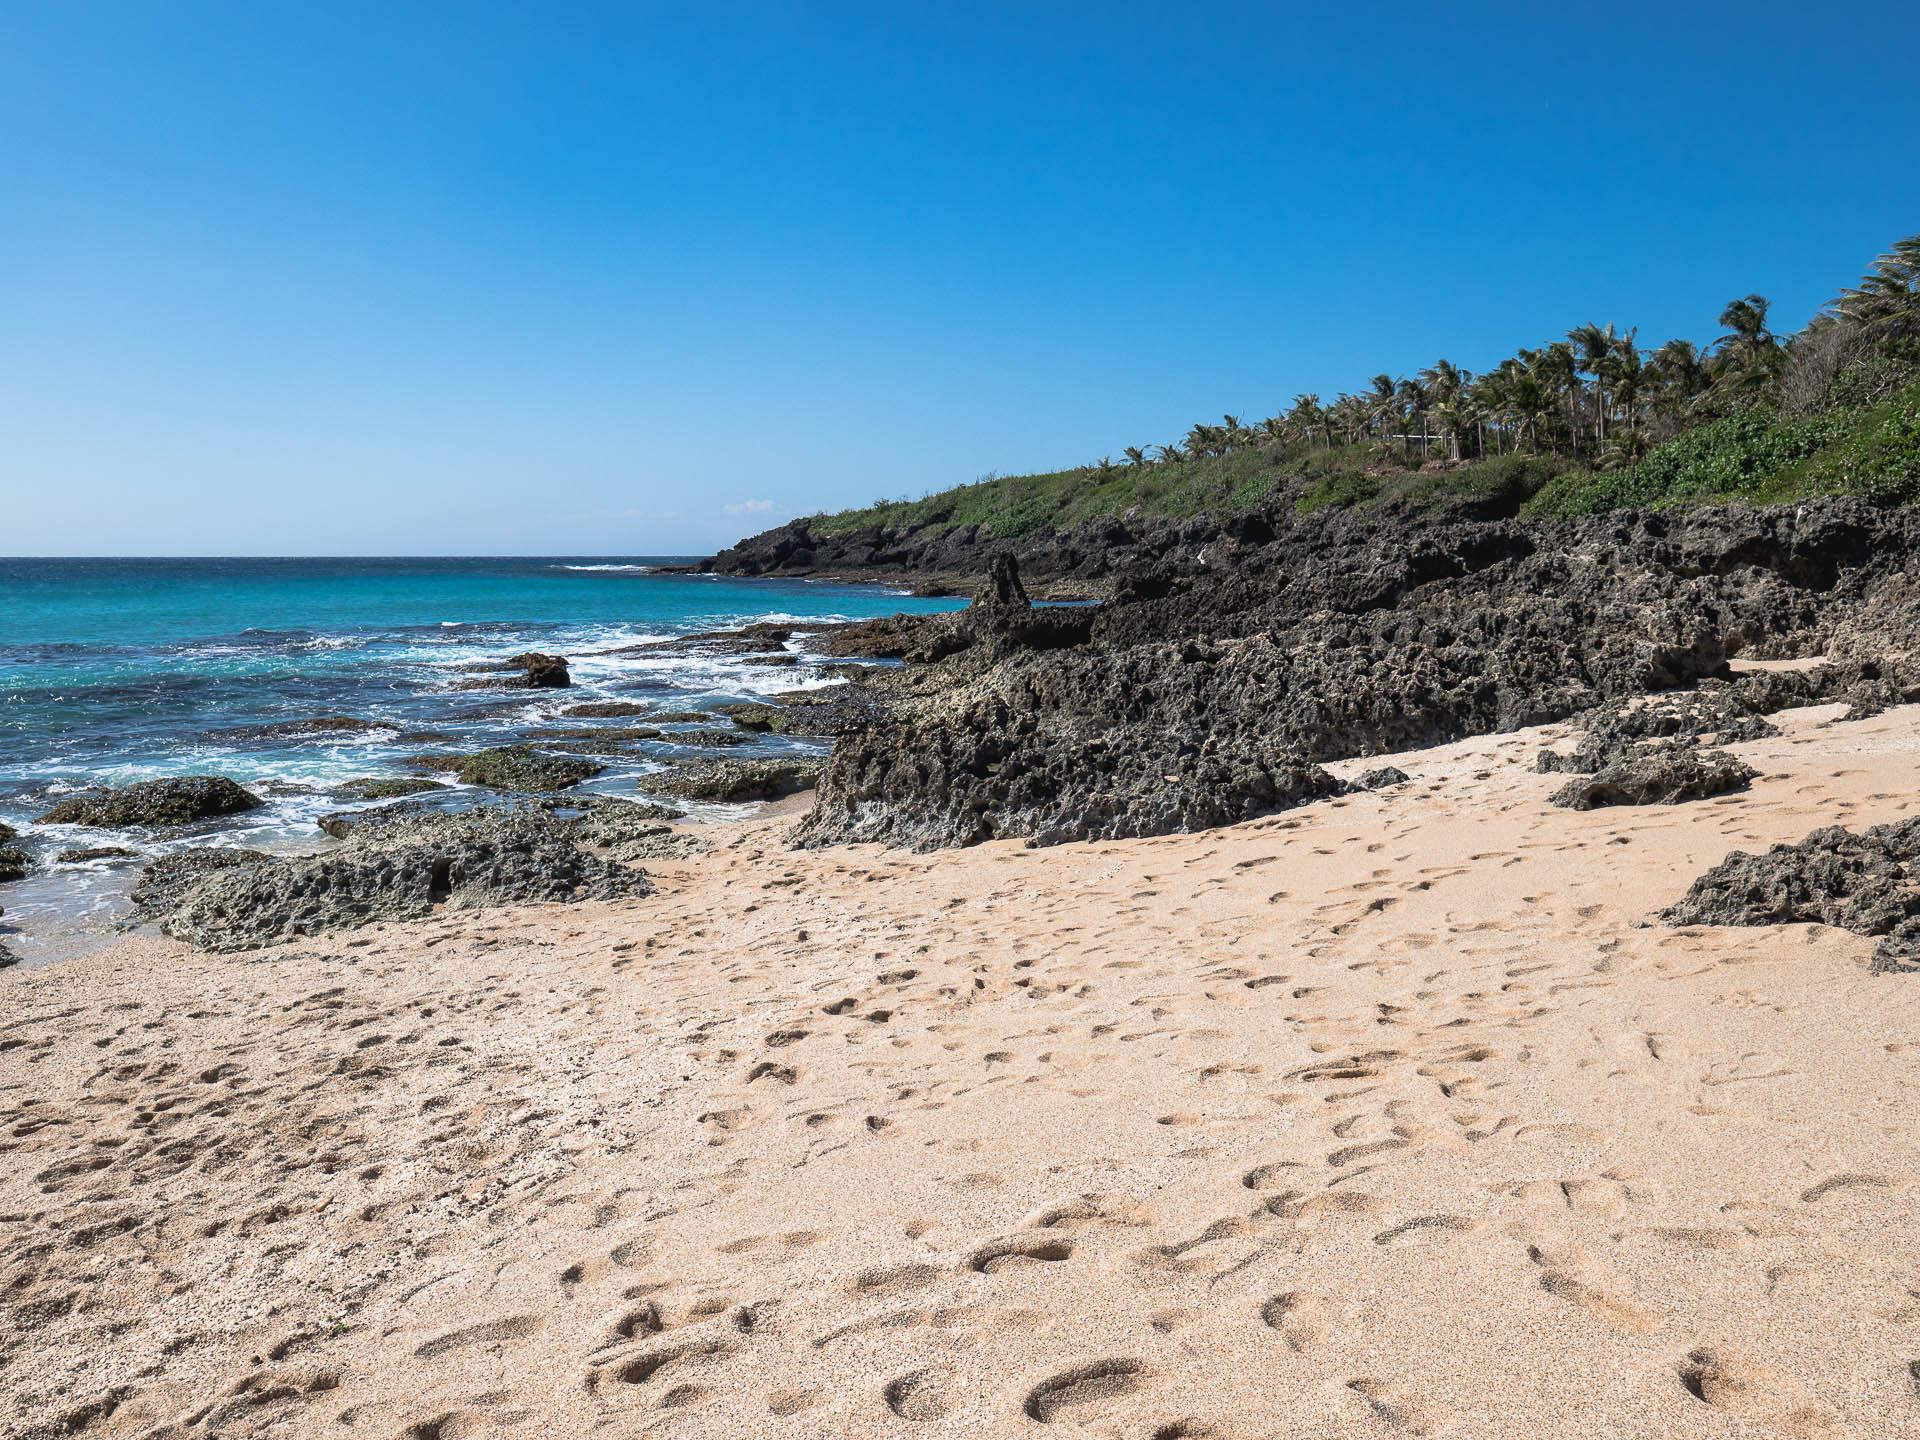 baisha plage - Les globe blogueurs - blog voyage nature